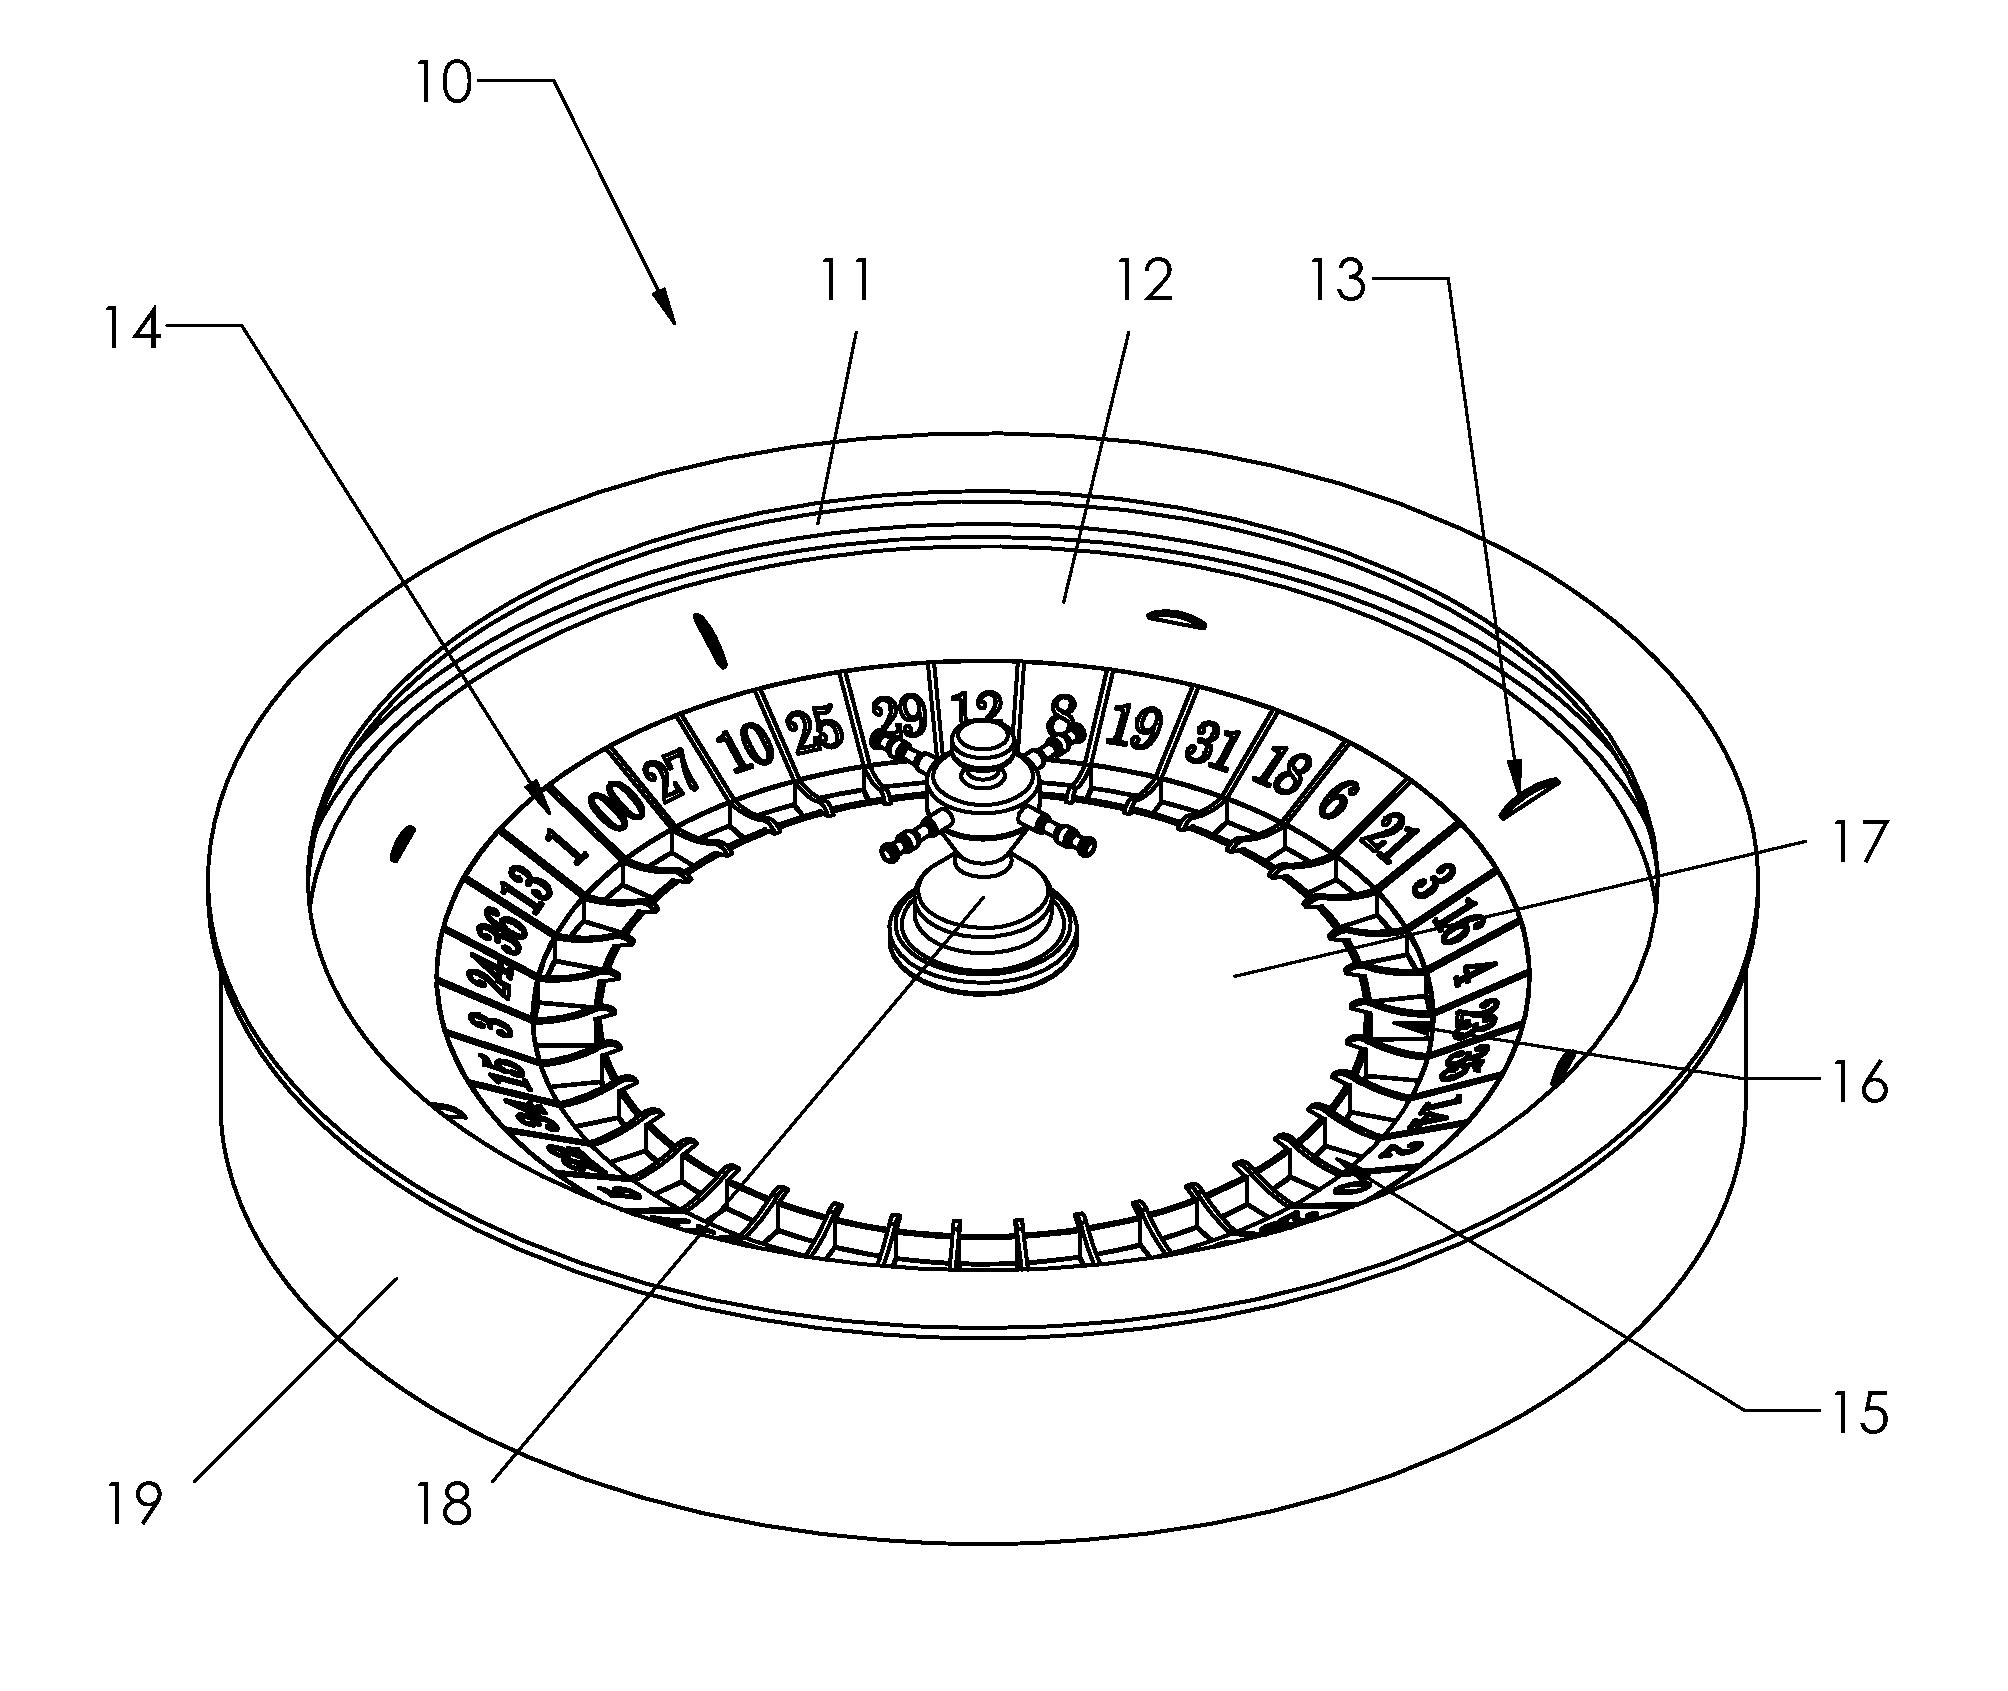 2008x1691 Roulette Wheel Rotation